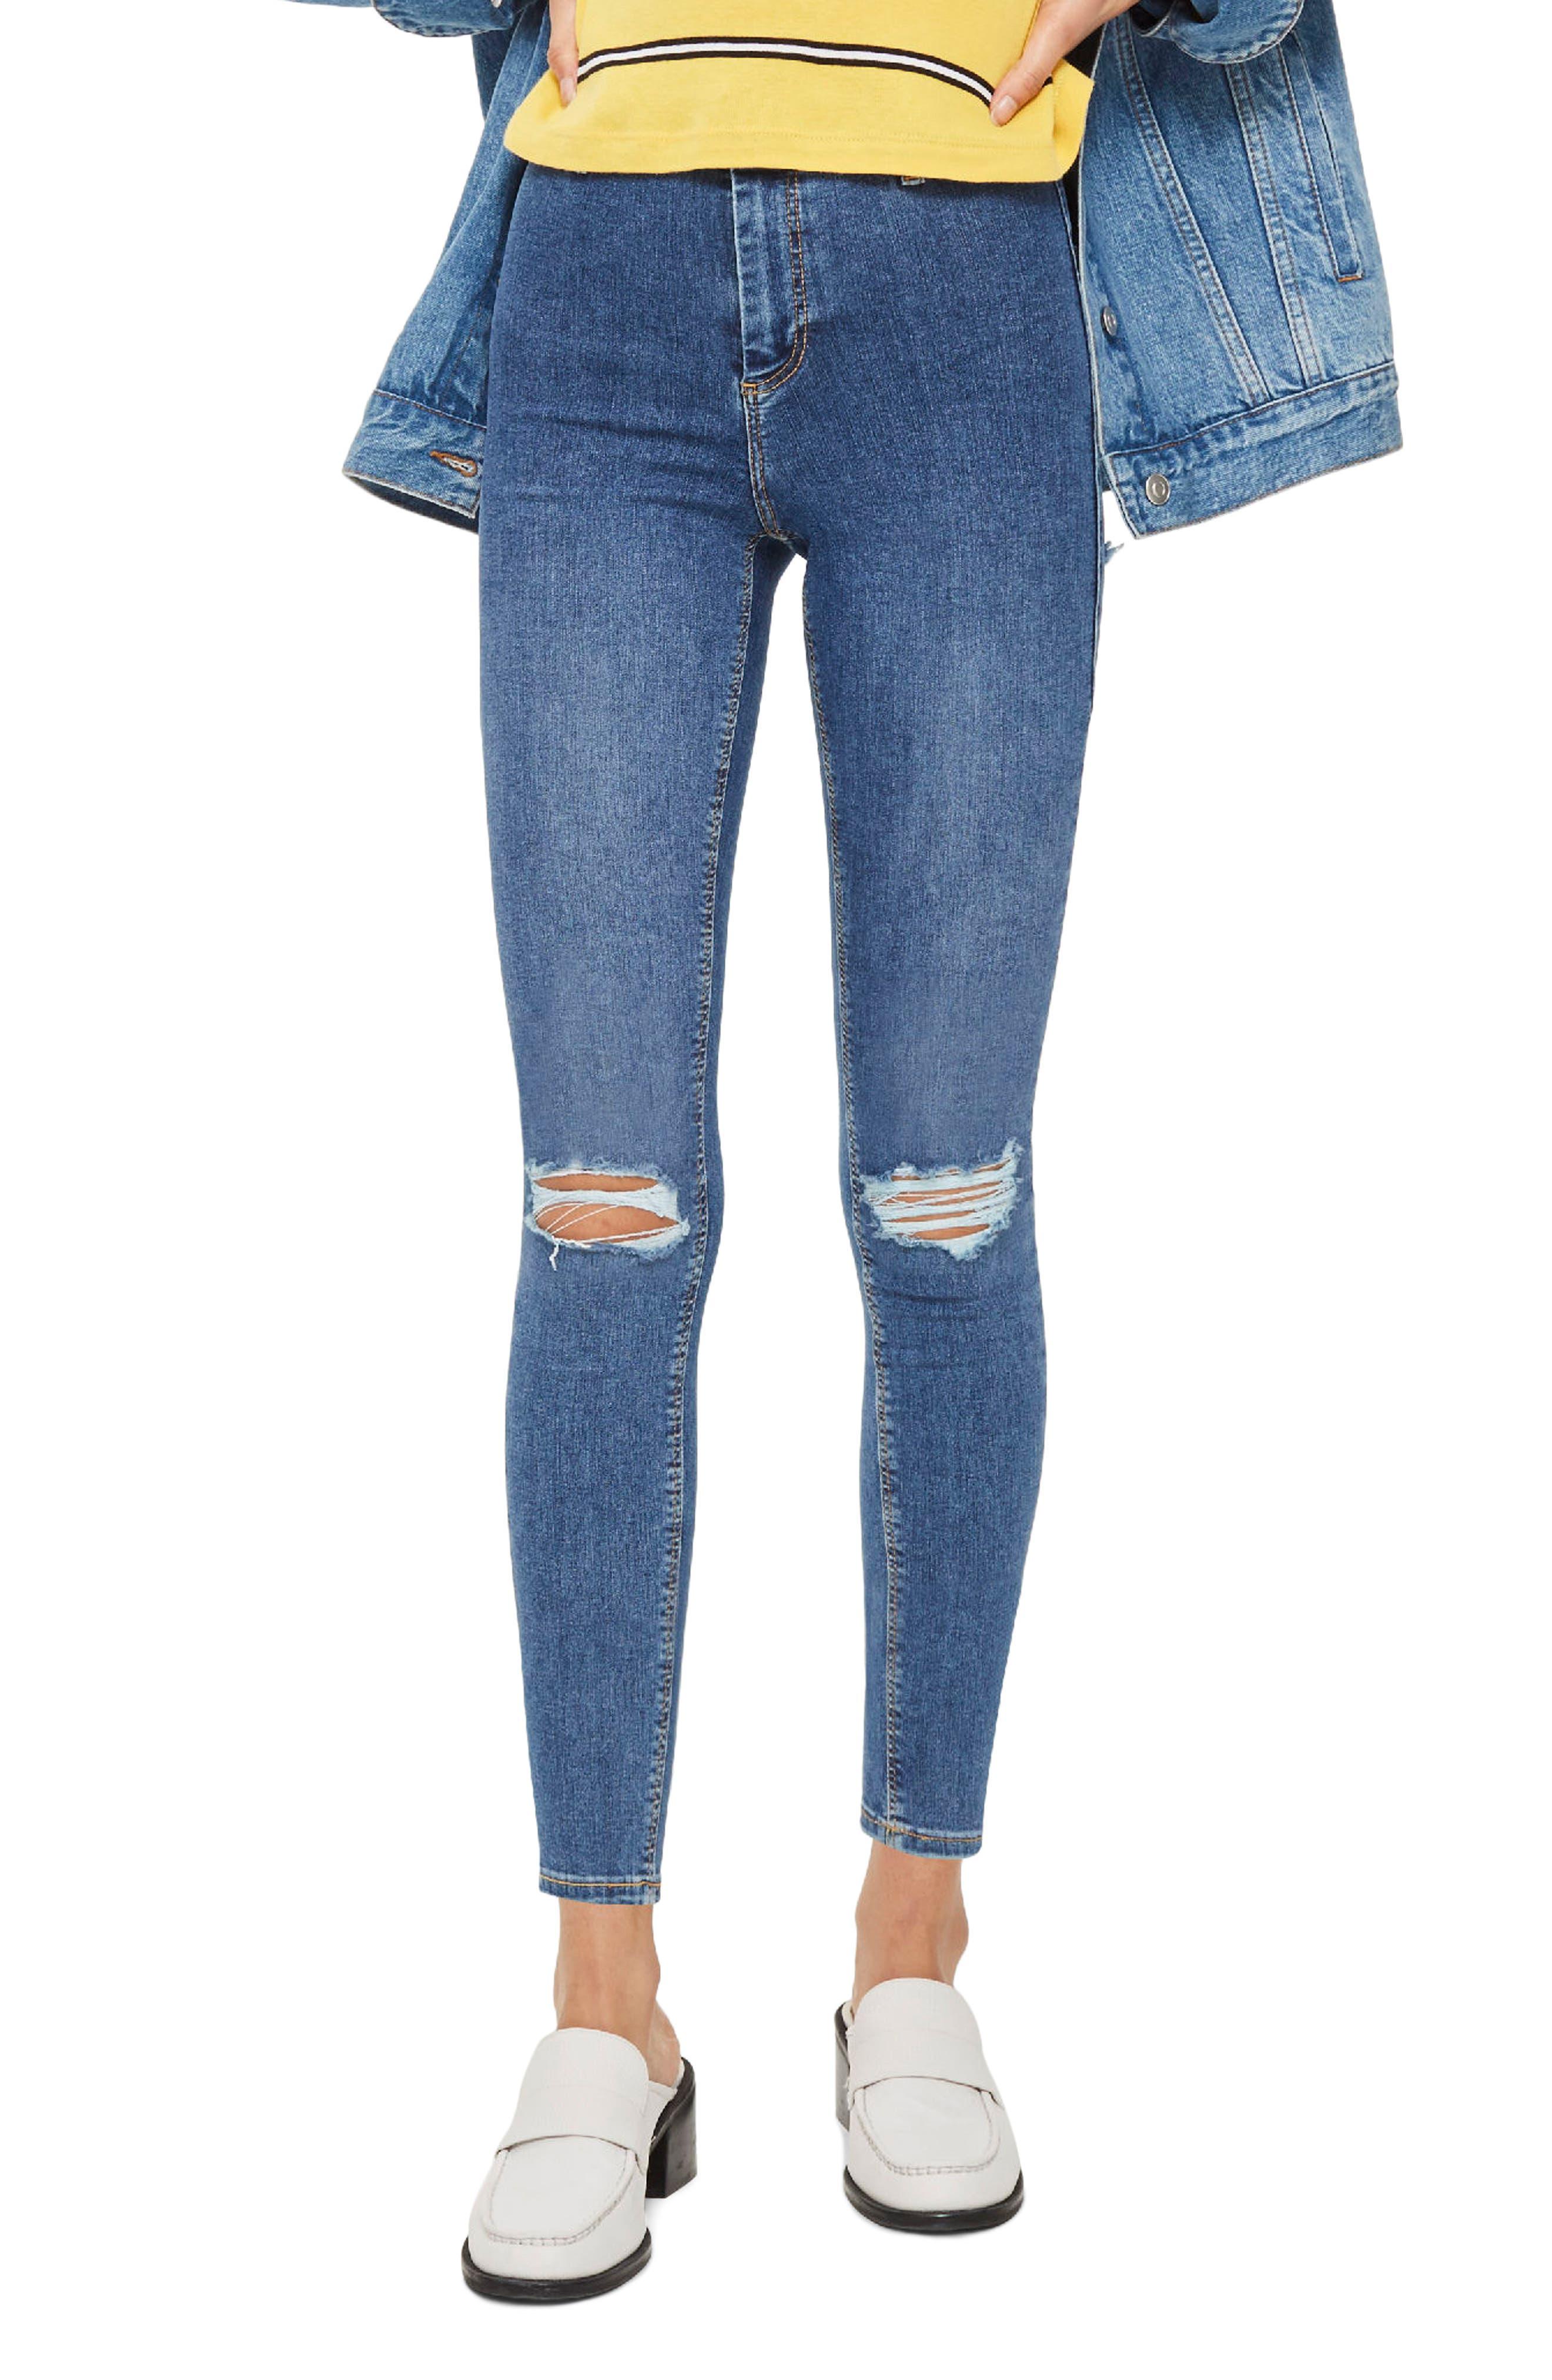 Main Image - Topshop Joni Distressed Skinny Jeans